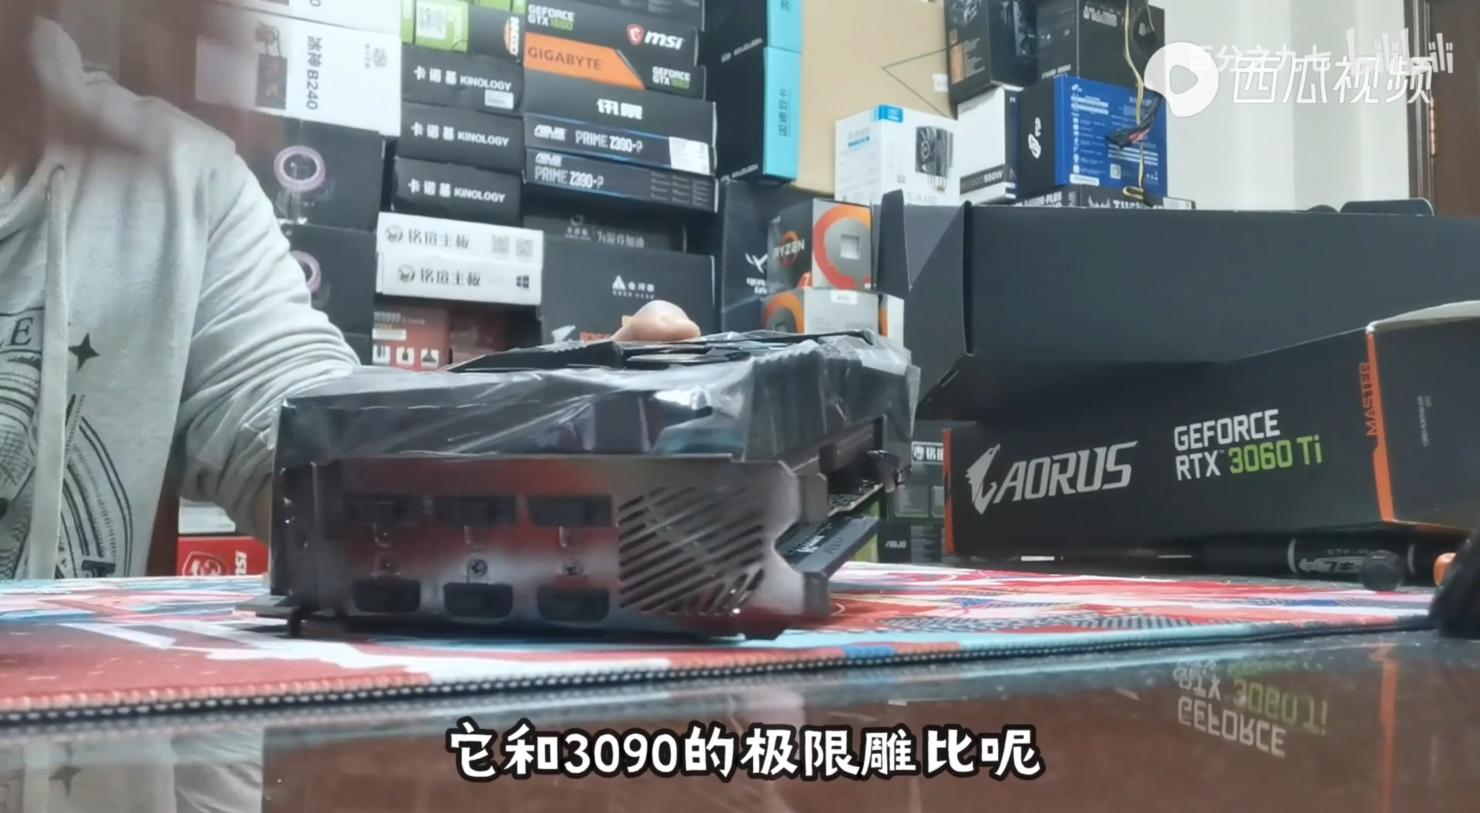 gigabyte-geforce-rtx-3060-ti-aorus-master-graphics-card_2